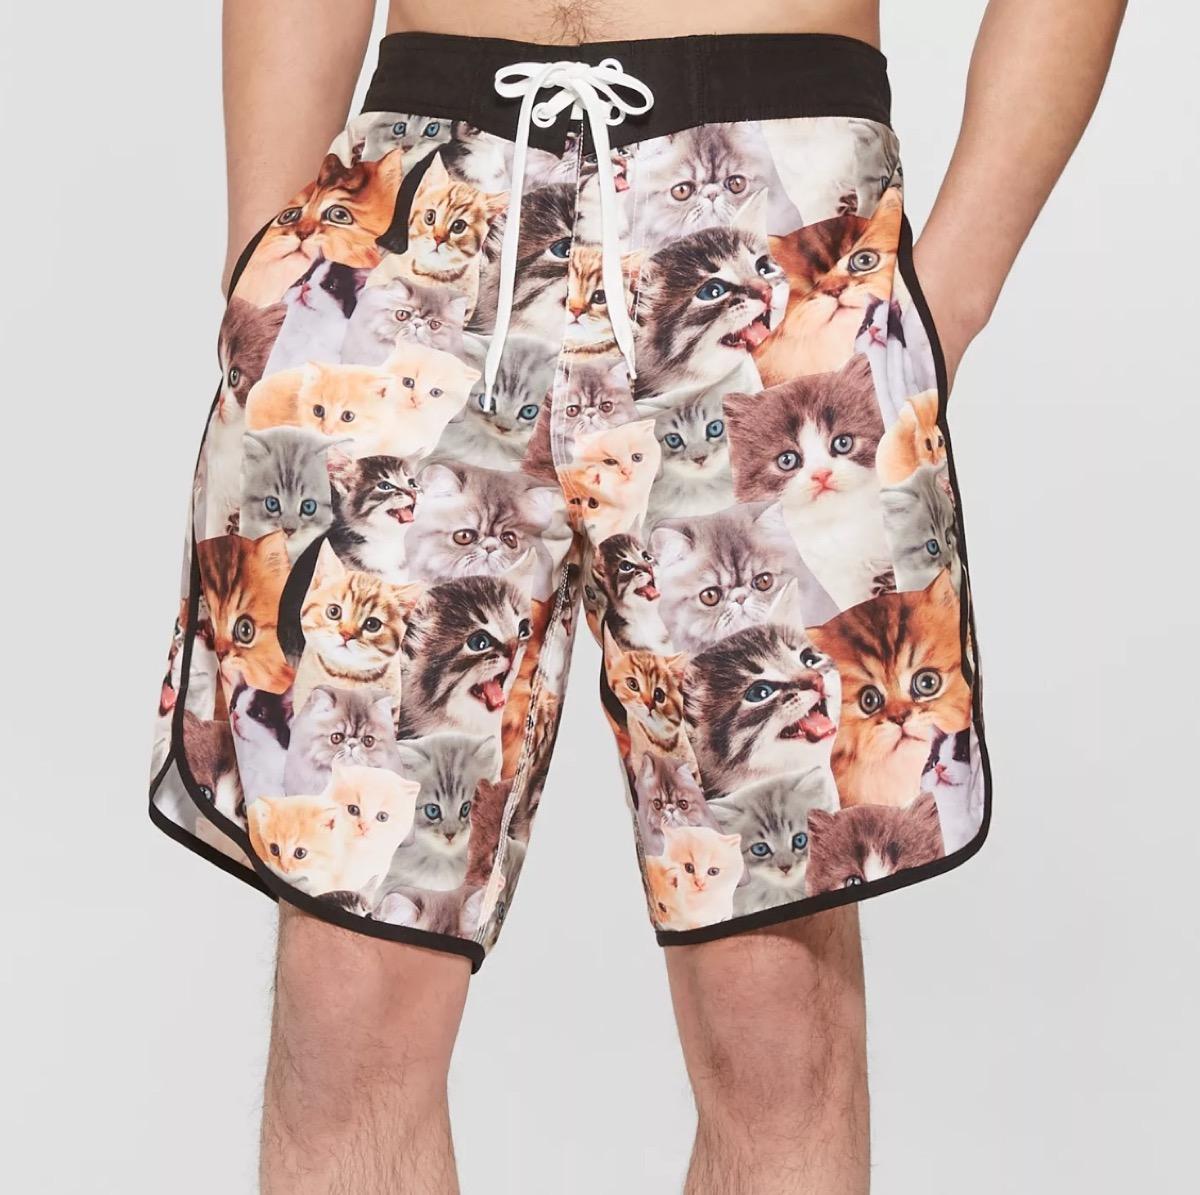 cat print board shorts, target beach essentials